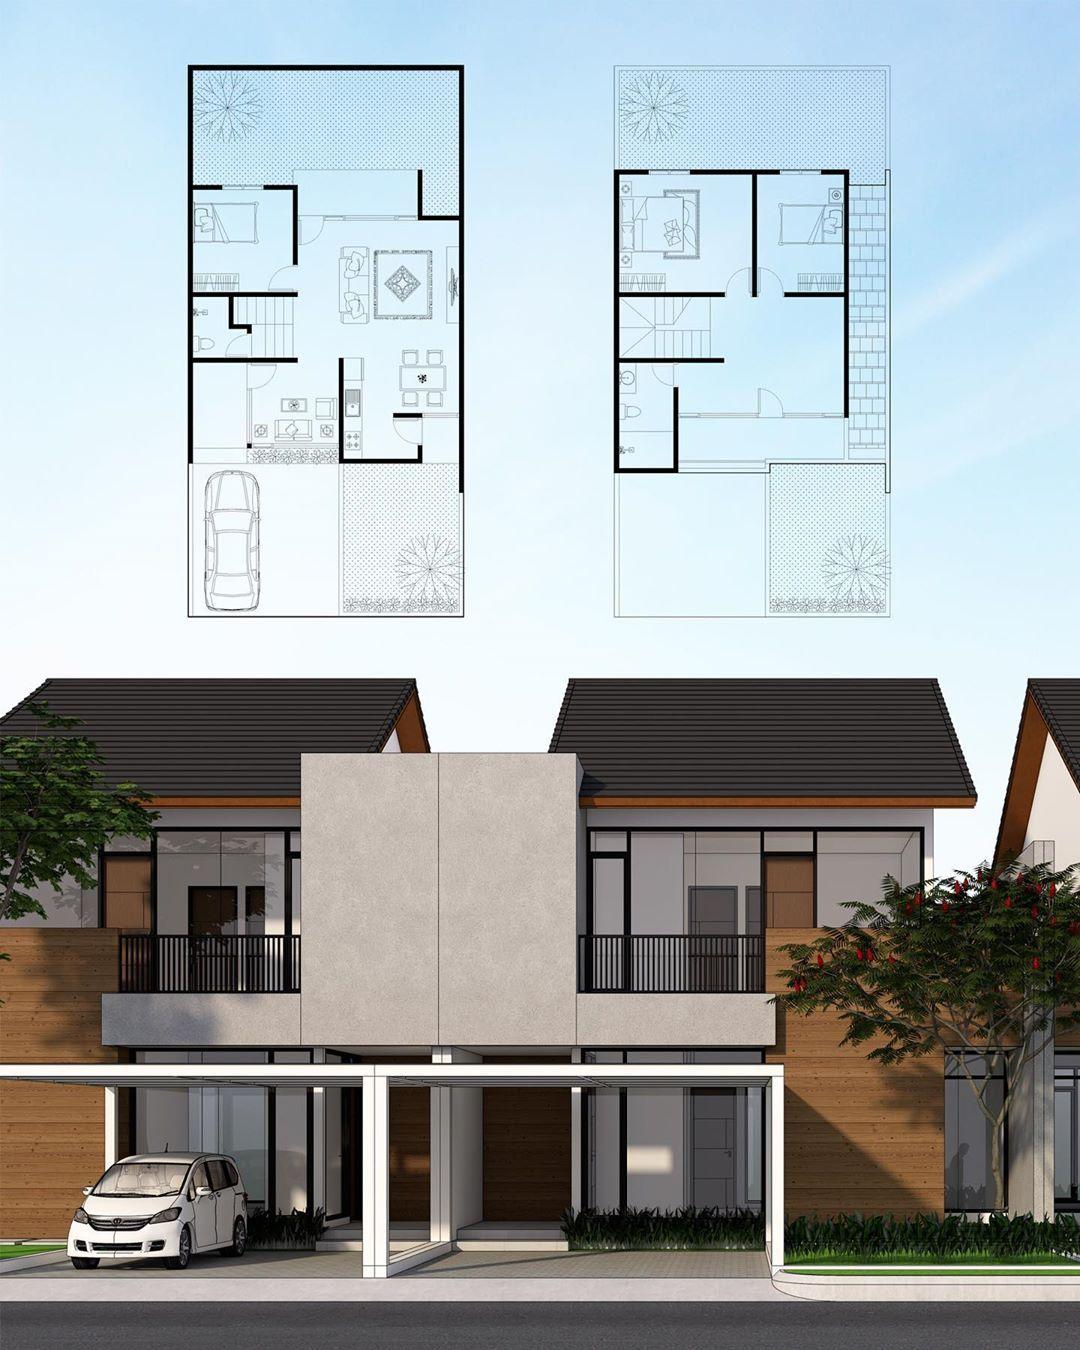 Rekabentuk Id Architecture Design Arsitektur Arsitekturindonesia Desain House Housedesign Arquitectura Ar Arsitektur Rumah Arsitektur Rumah Minimalis